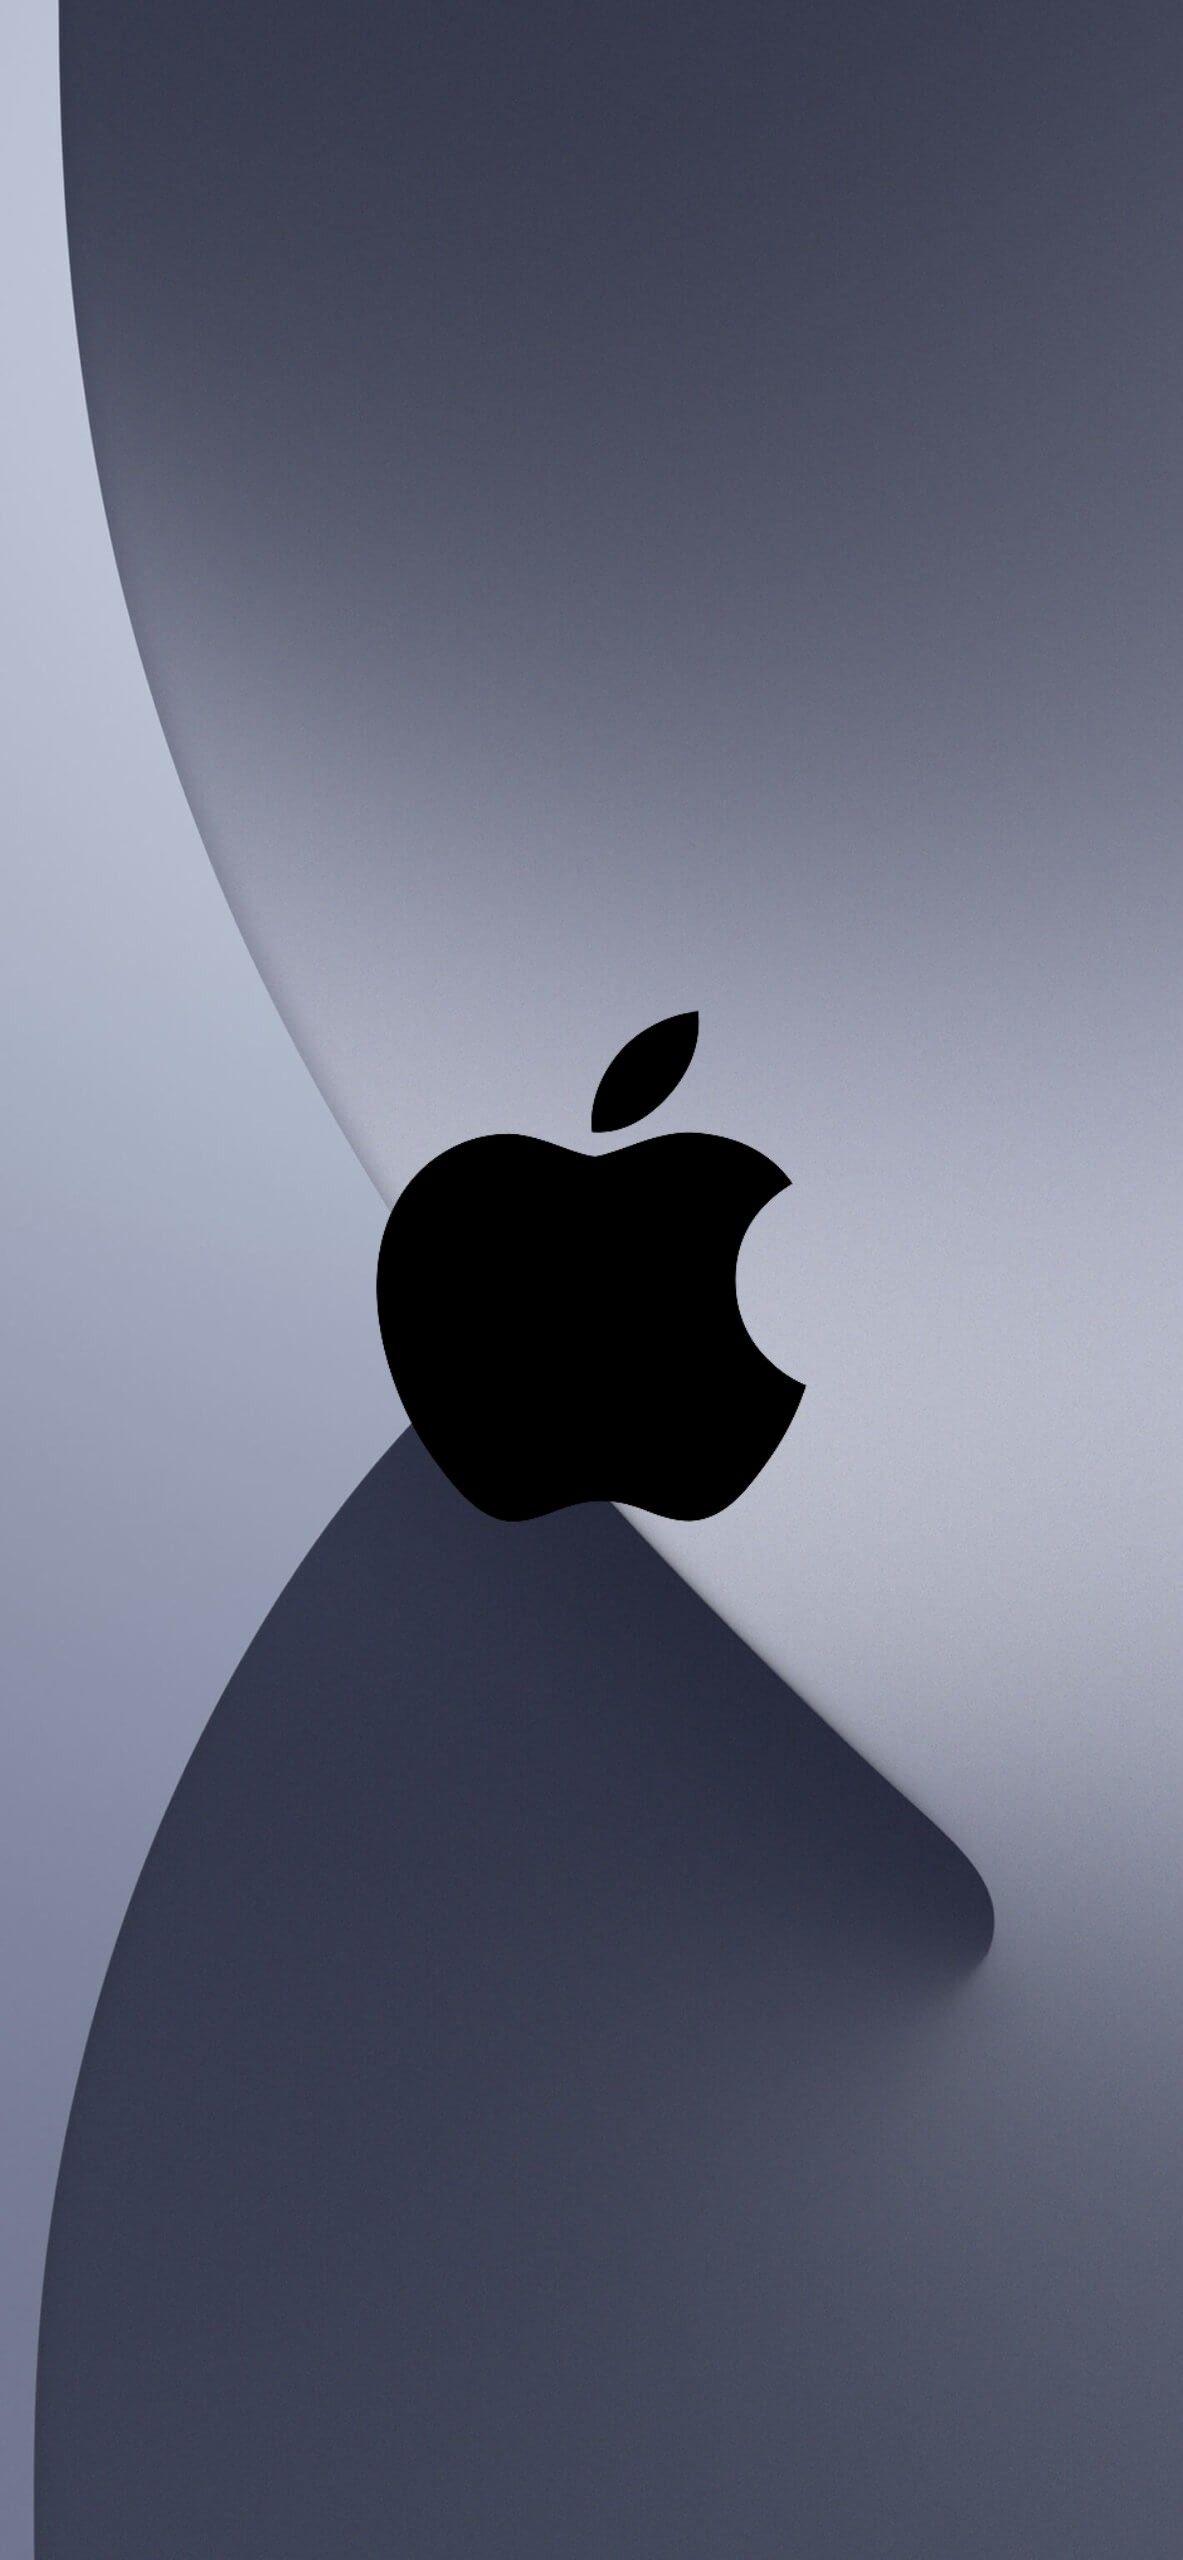 Pin By Bossryuken On Iphone Wallpaper In 2020 Apple Iphone Wallpaper Hd Iphone Wallpaper Apple Wallpaper Iphone